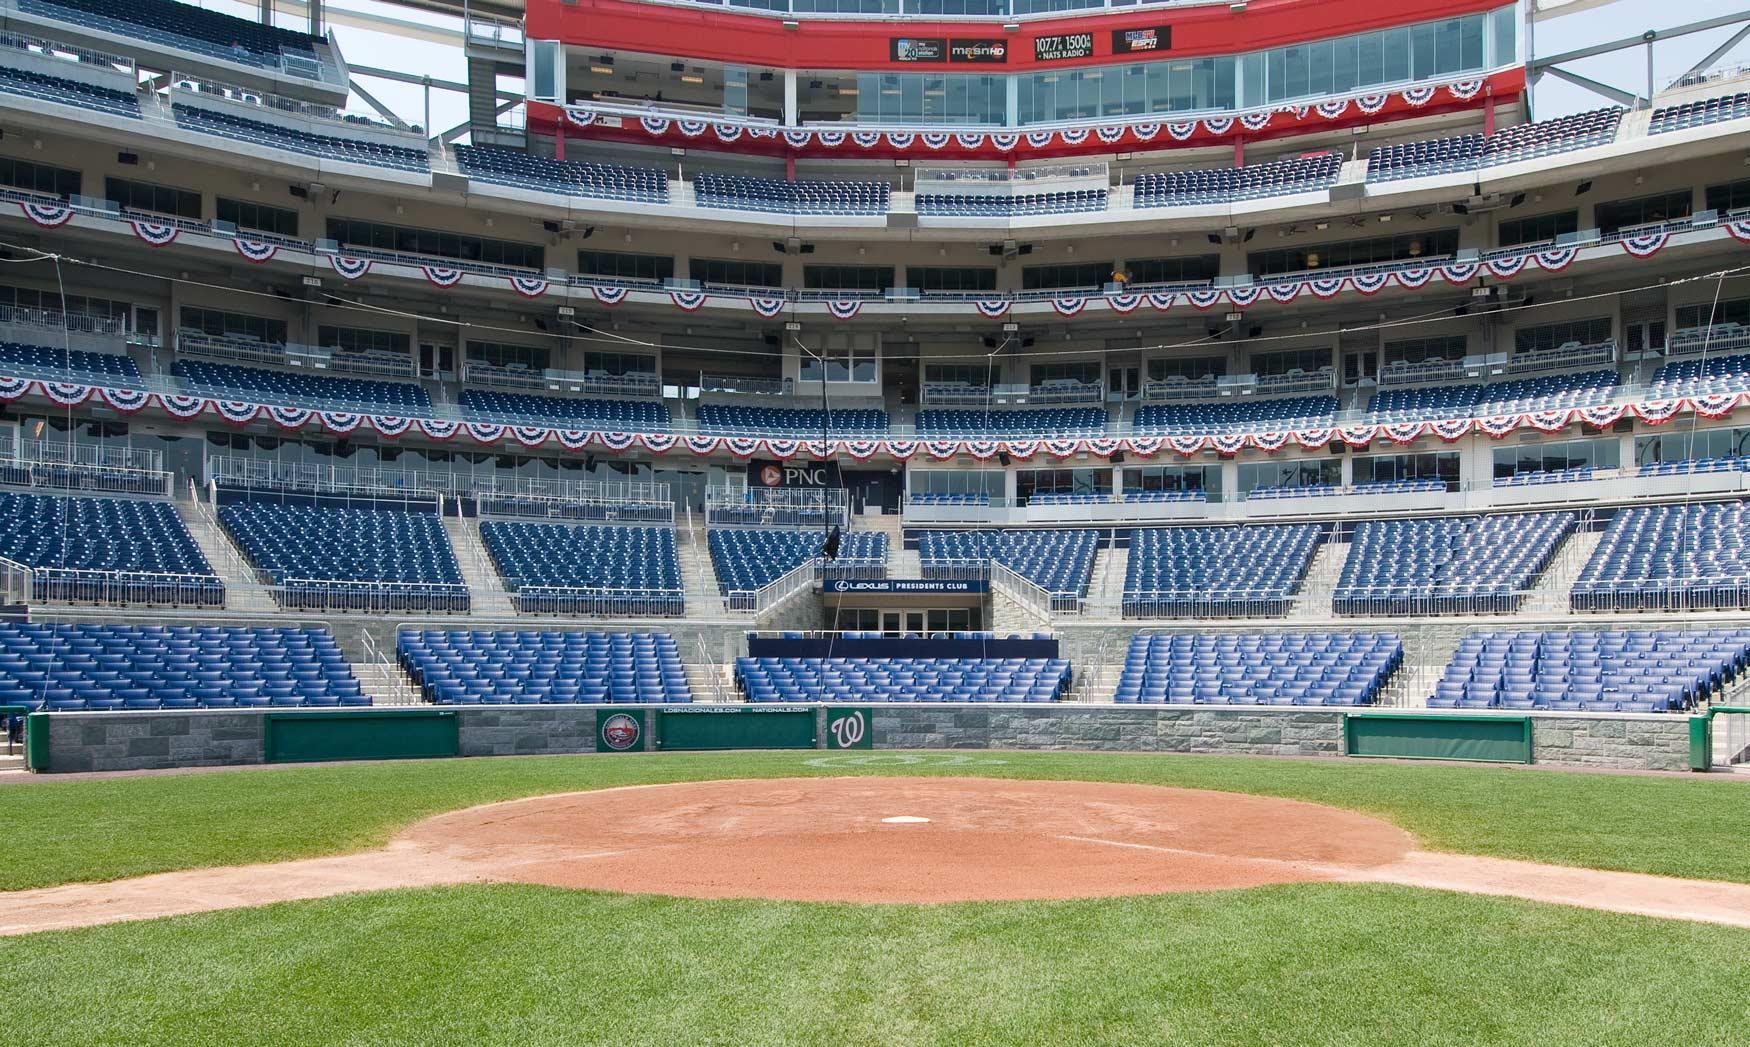 Nationals-Ballpark-1.jpg